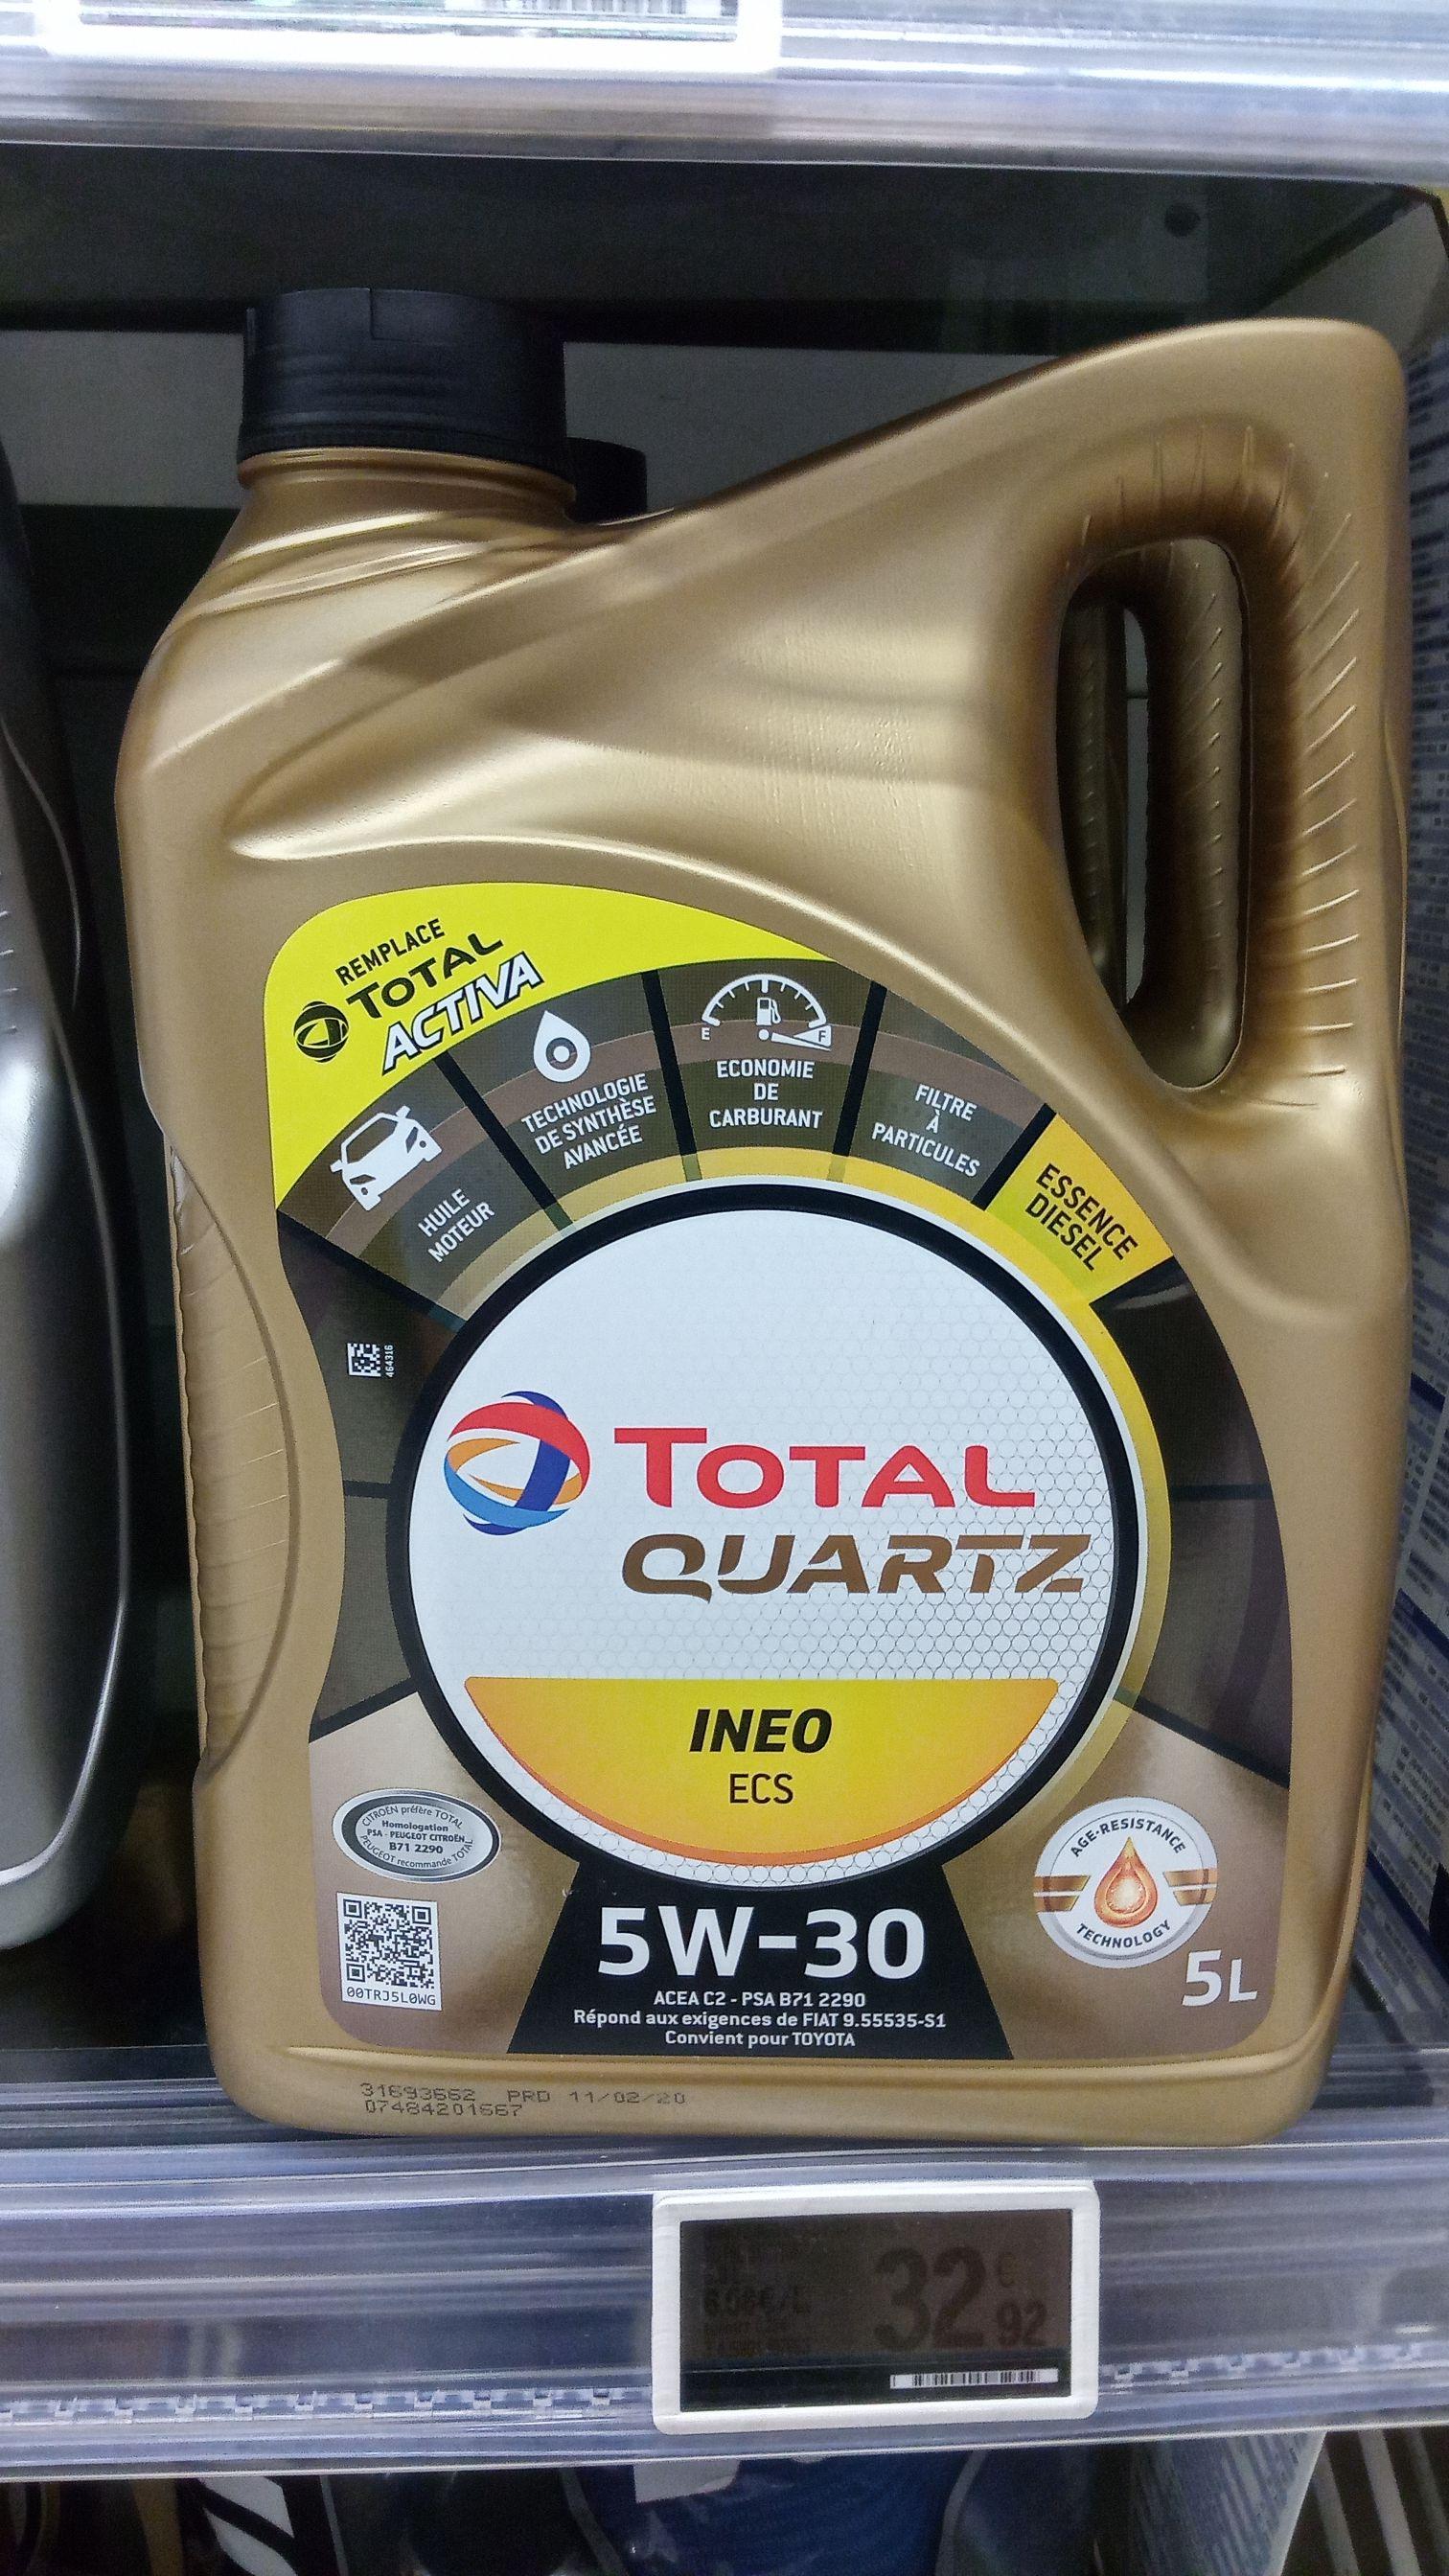 1 Bidon d'huile Total Quartz Ineo ECS 5W30 5L - Civrieux d'azergue (69)